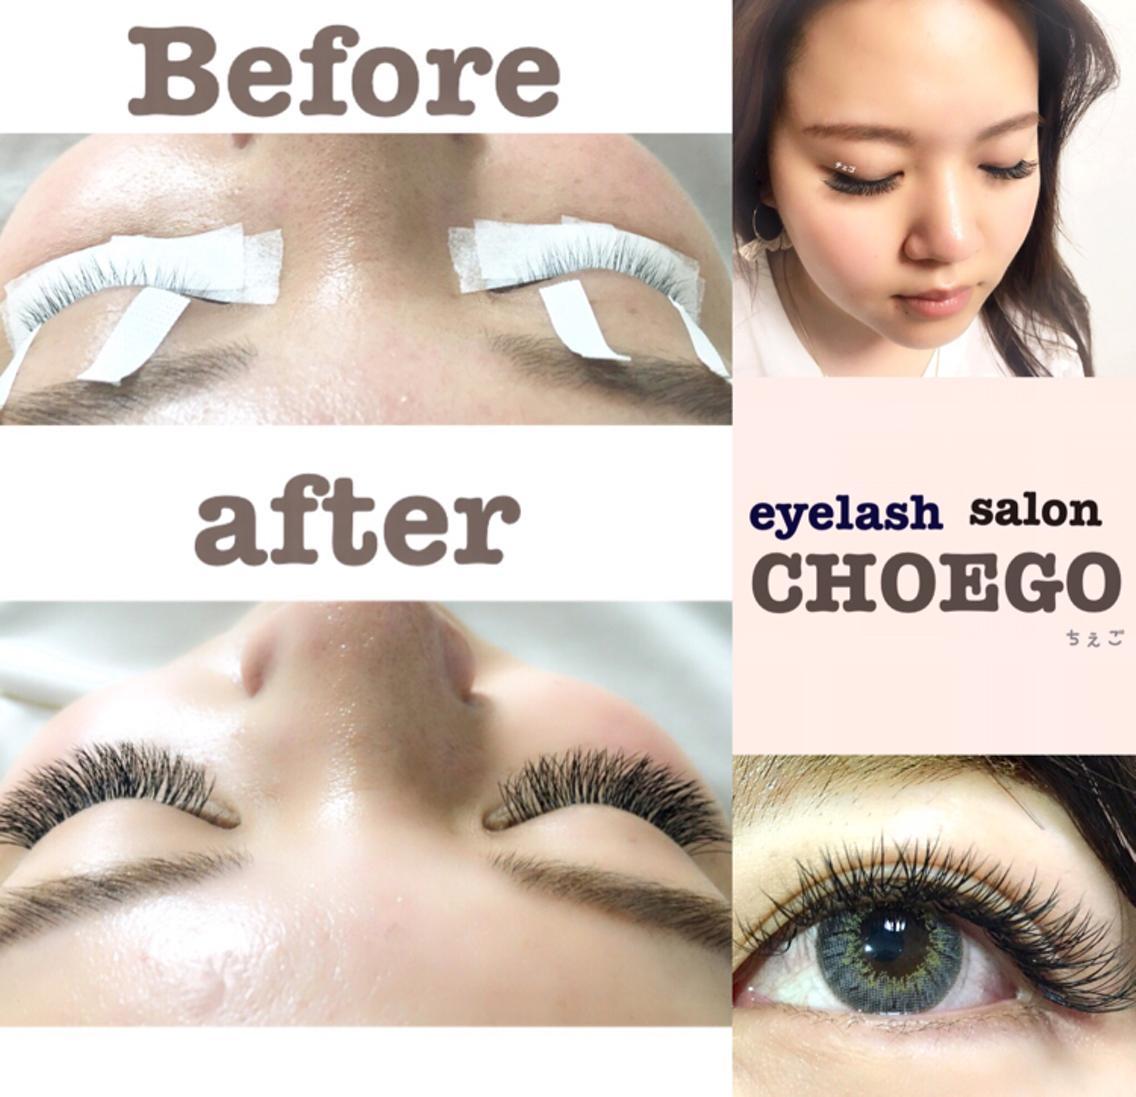 eyelash salon CHOEGO(ちぇご)所属・マツエクサロンCHOEGOの掲載